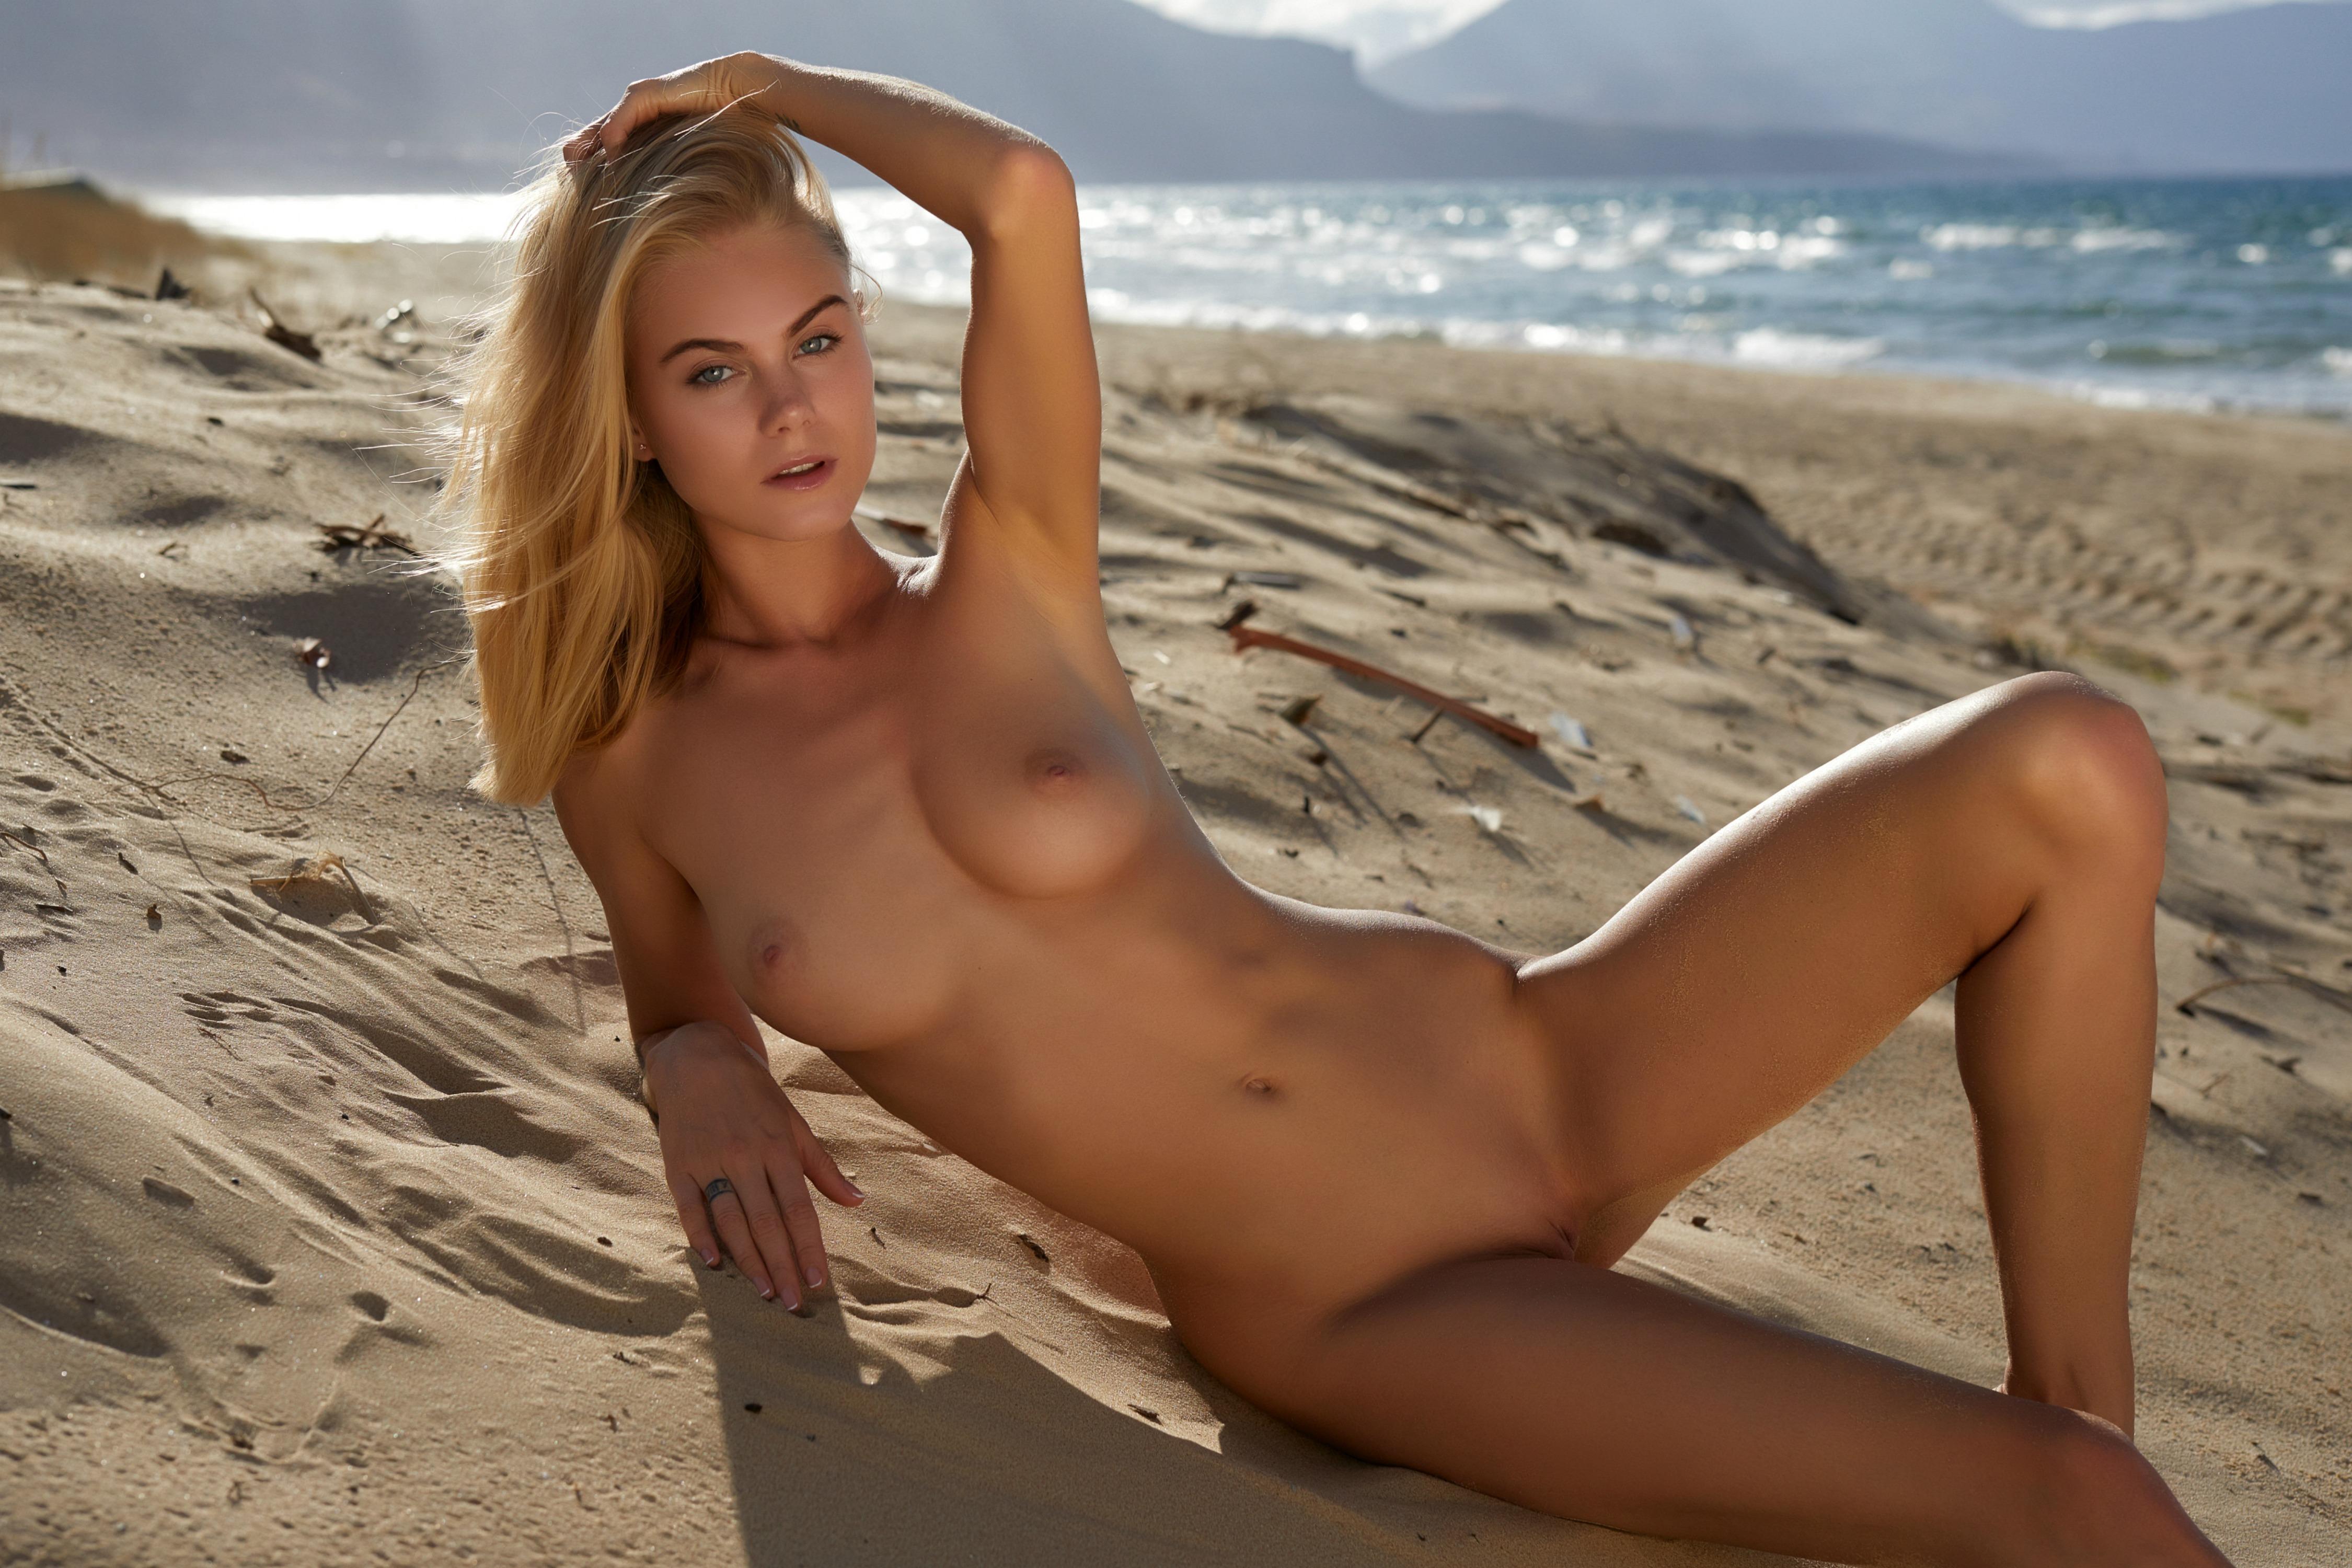 Indonesian jugs palm beach blonde pussy sex movie voyeur